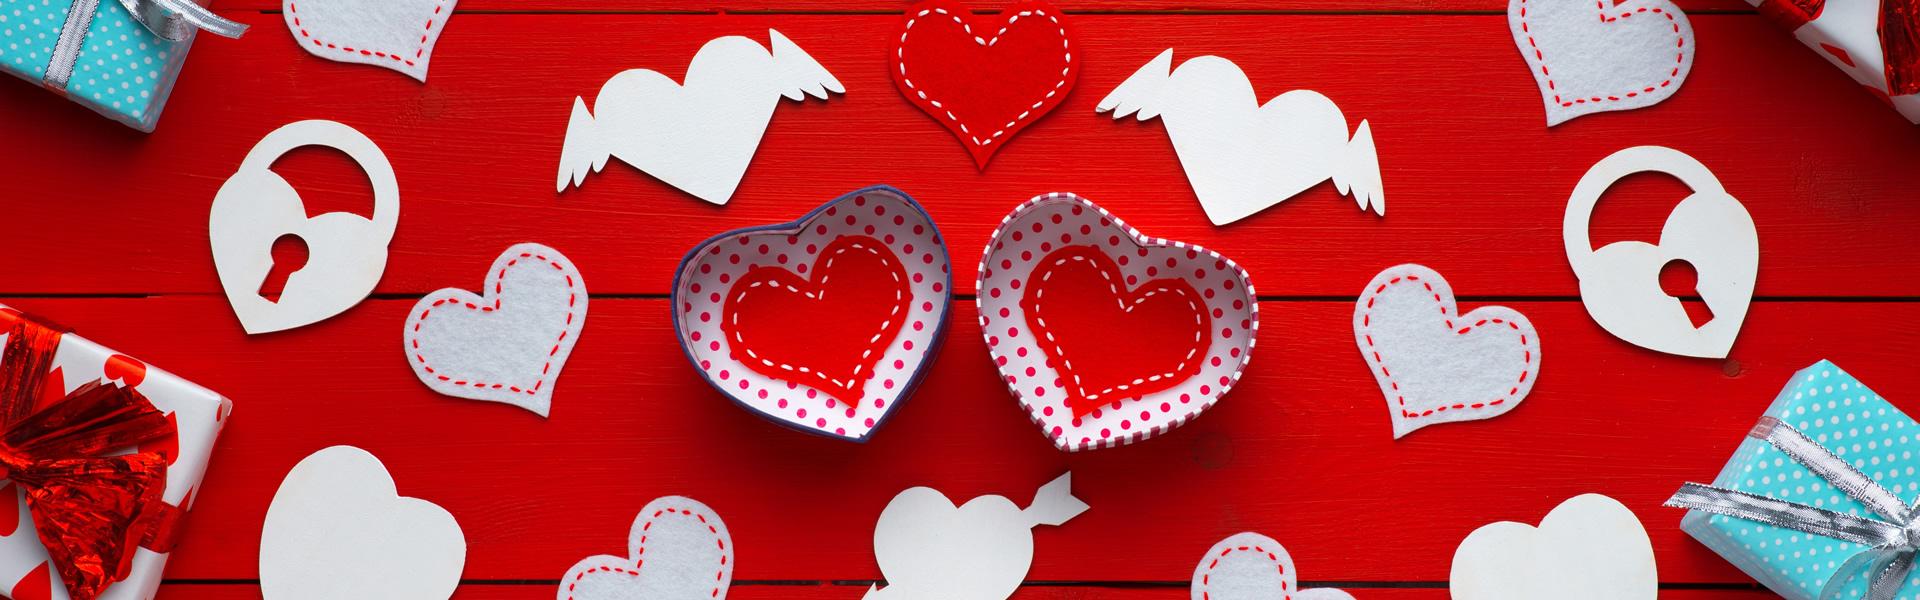 Wallpaper San Valentino